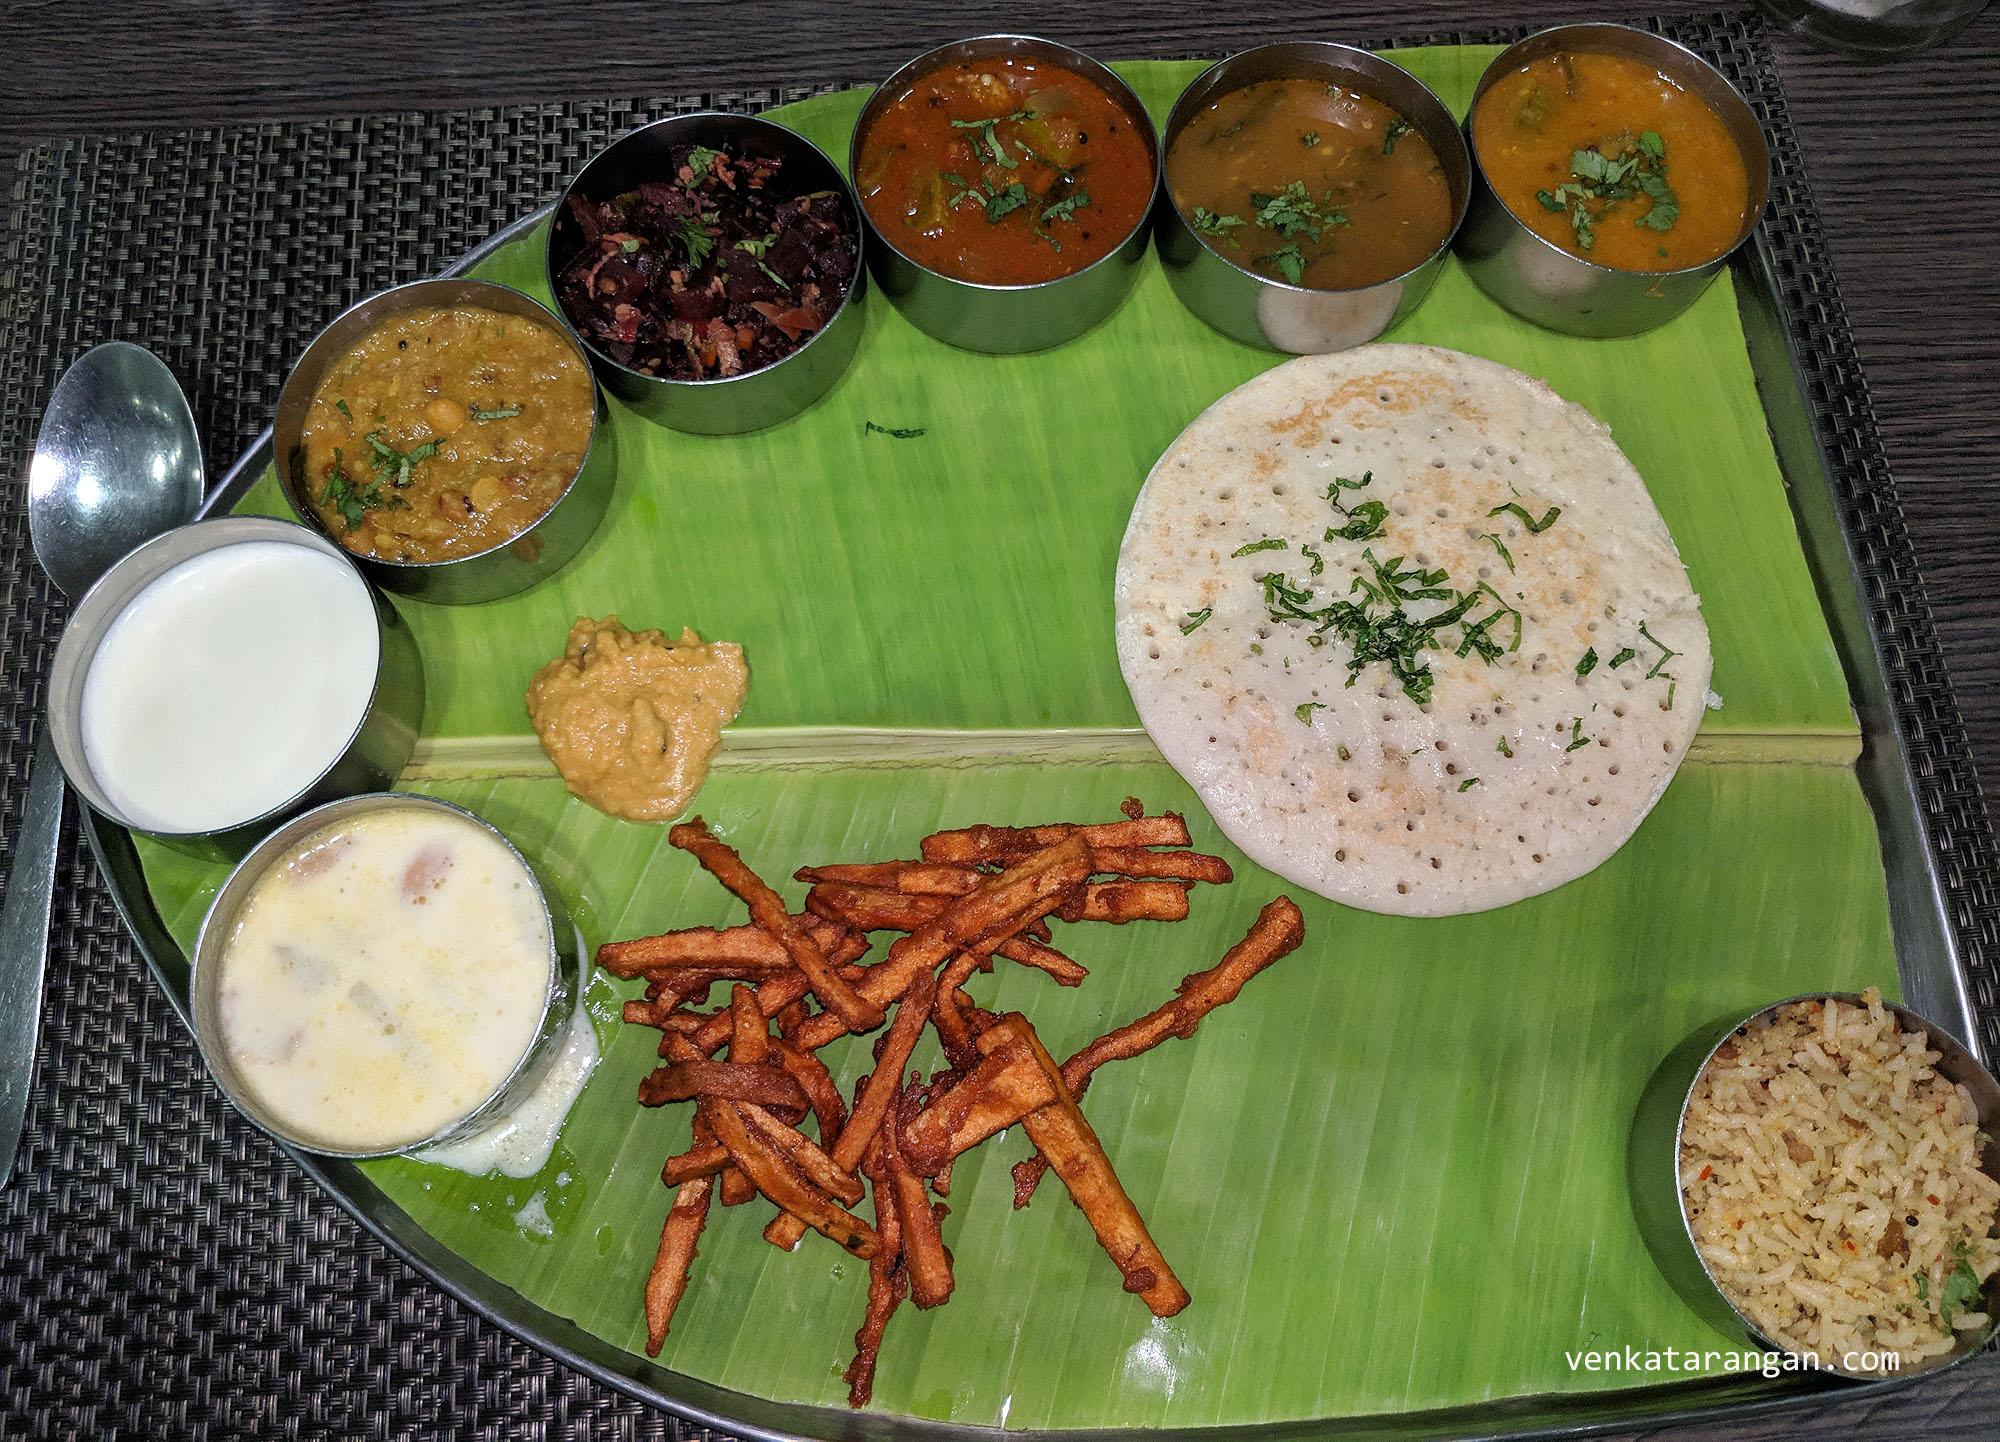 The South India Vegetarian Thali Meal (தென்னிந்தியா சைவ சாப்பாடு) that I had in GRT Regency, Tiruttani (திருத்தணி)